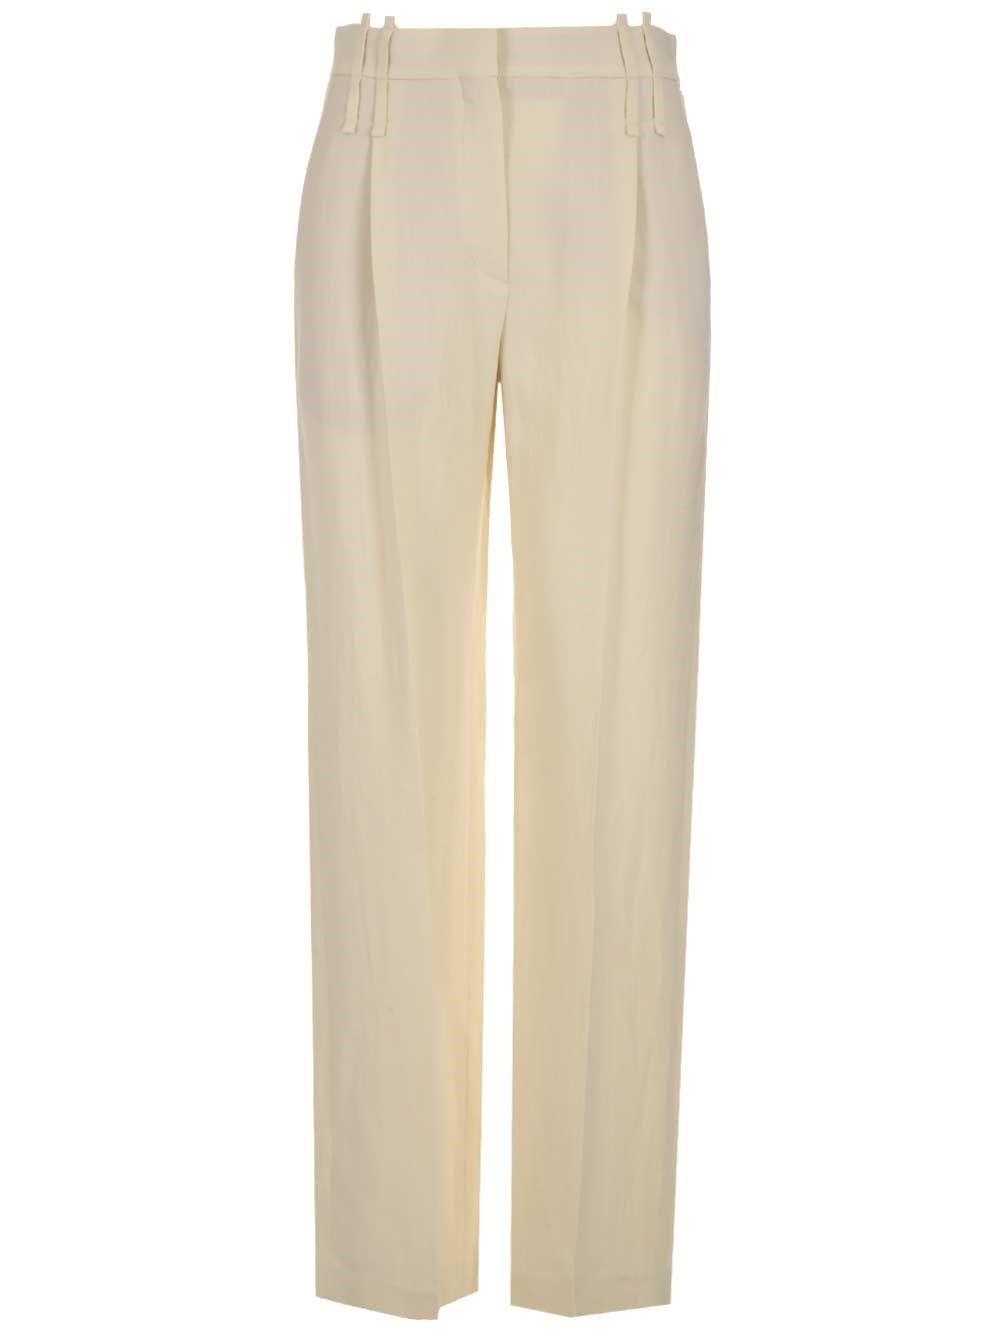 Brunello Cucinelli BRUNELLO CUCINELLI WOMEN'S WHITE OTHER MATERIALS PANTS